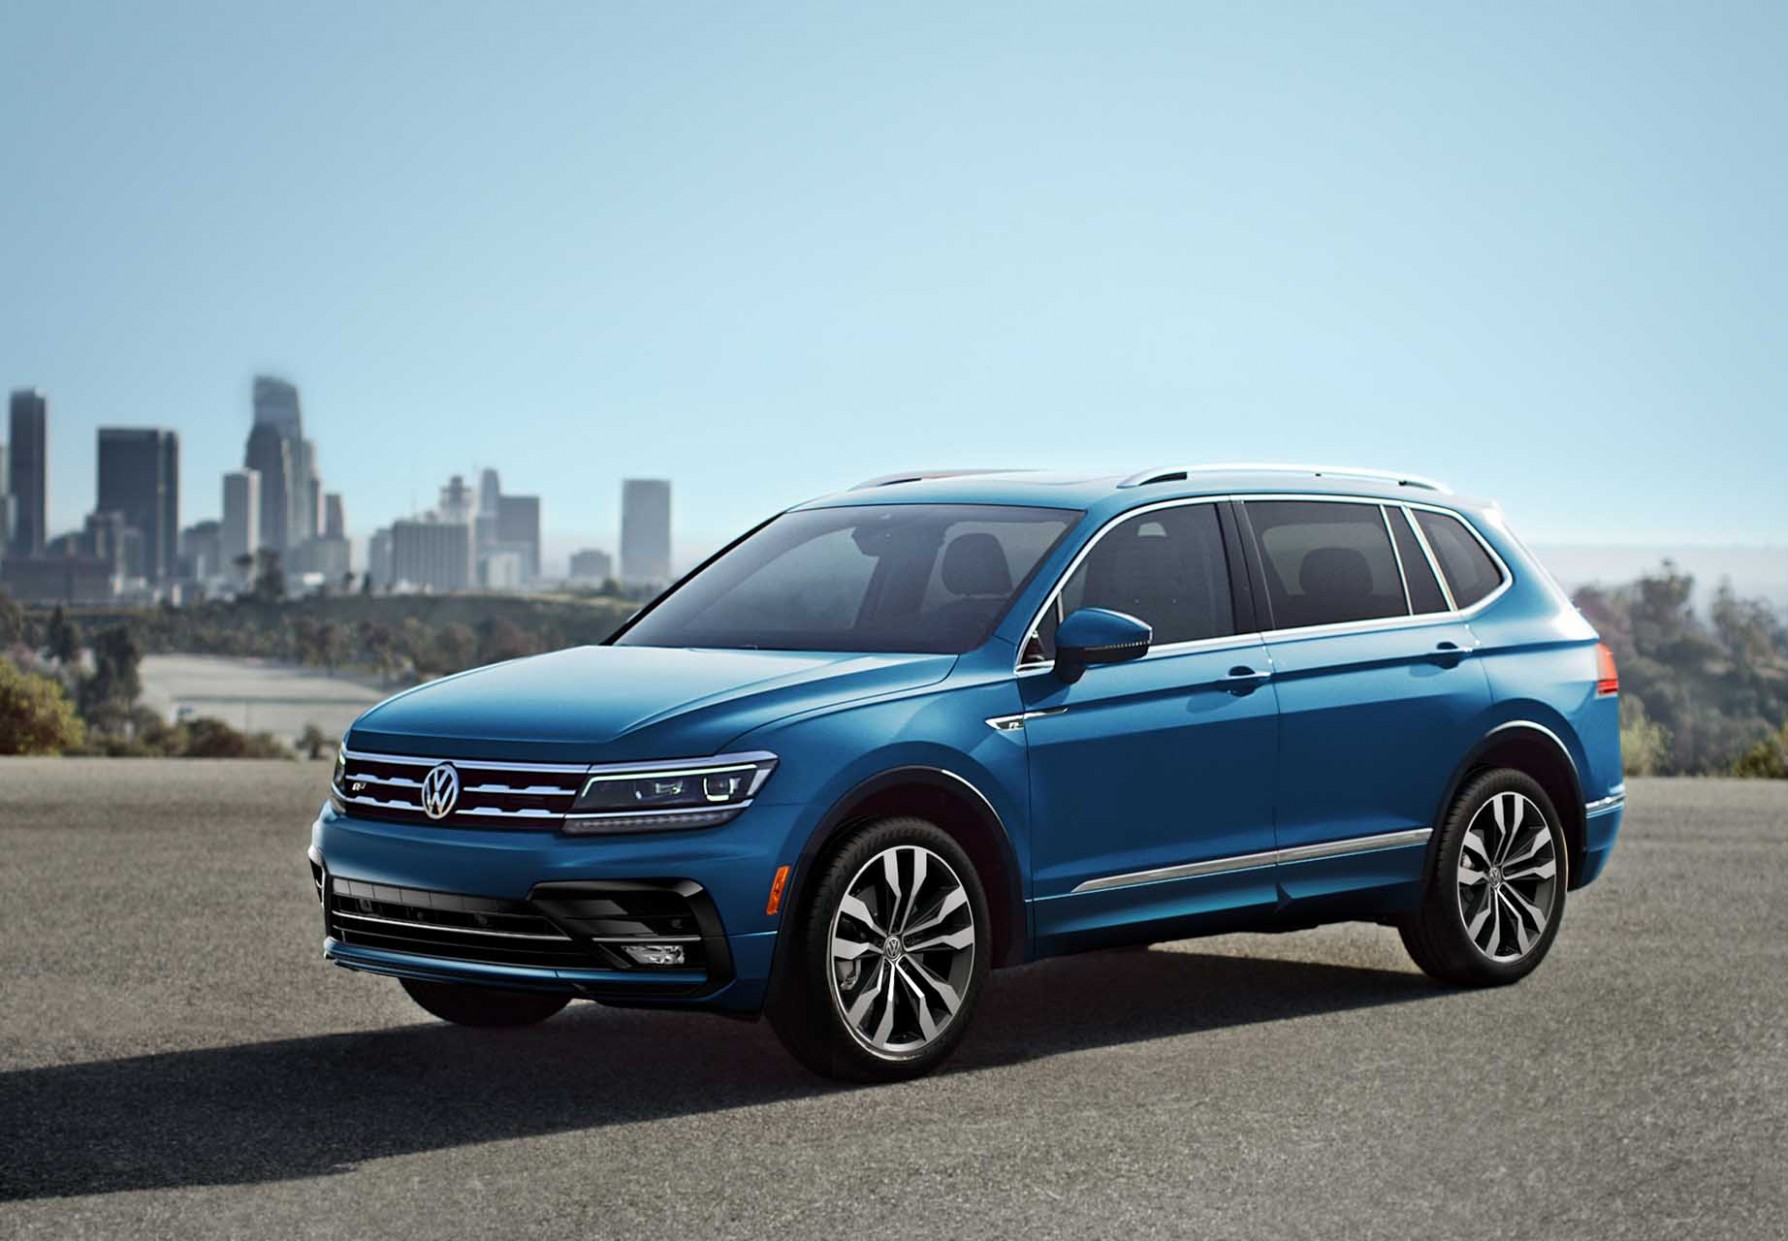 4 Volkswagen Tiguan (VW) Review, Ratings, Specs, Prices, and - Volkswagen Suv 2021